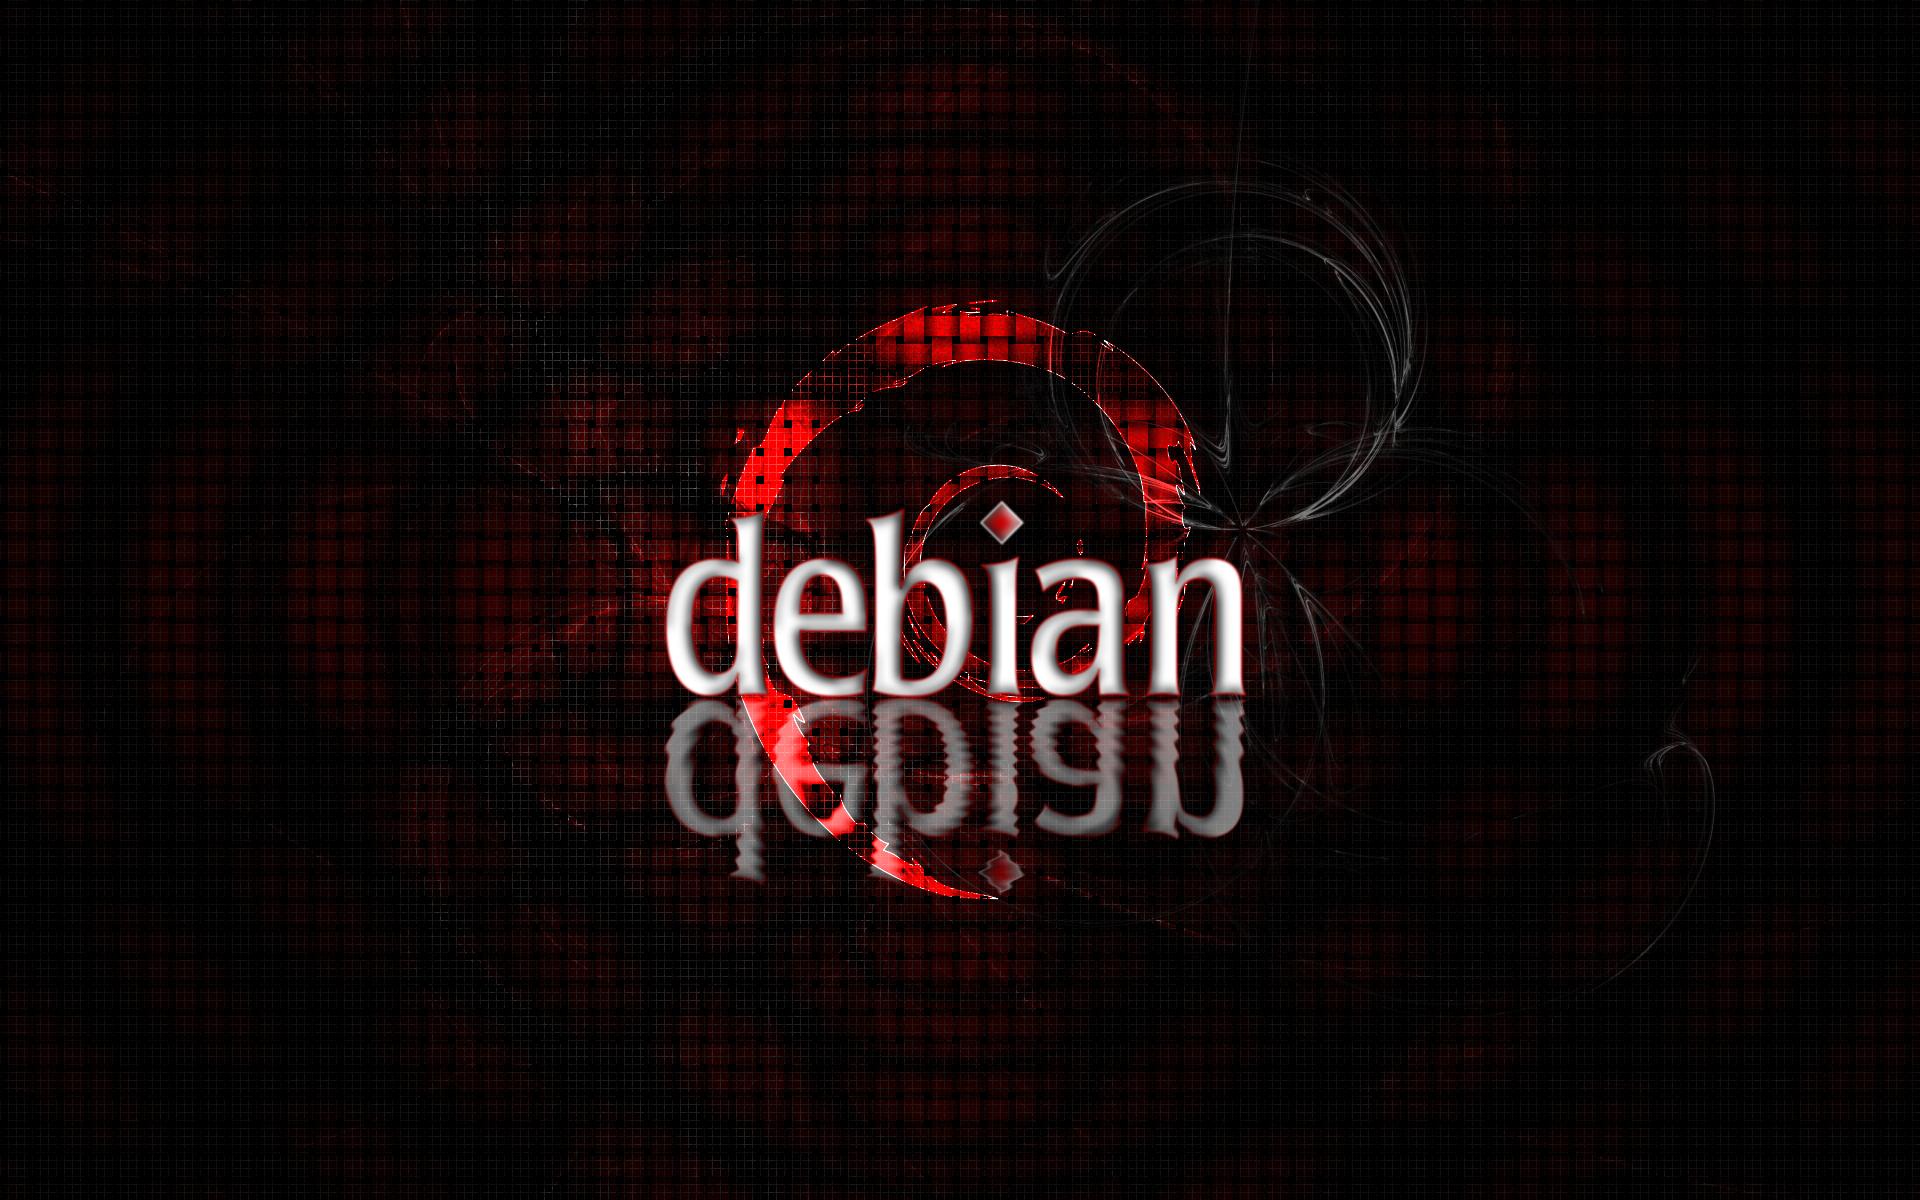 Debian Wallpaper 1920x1200 Hd For Desktop Free Download Os